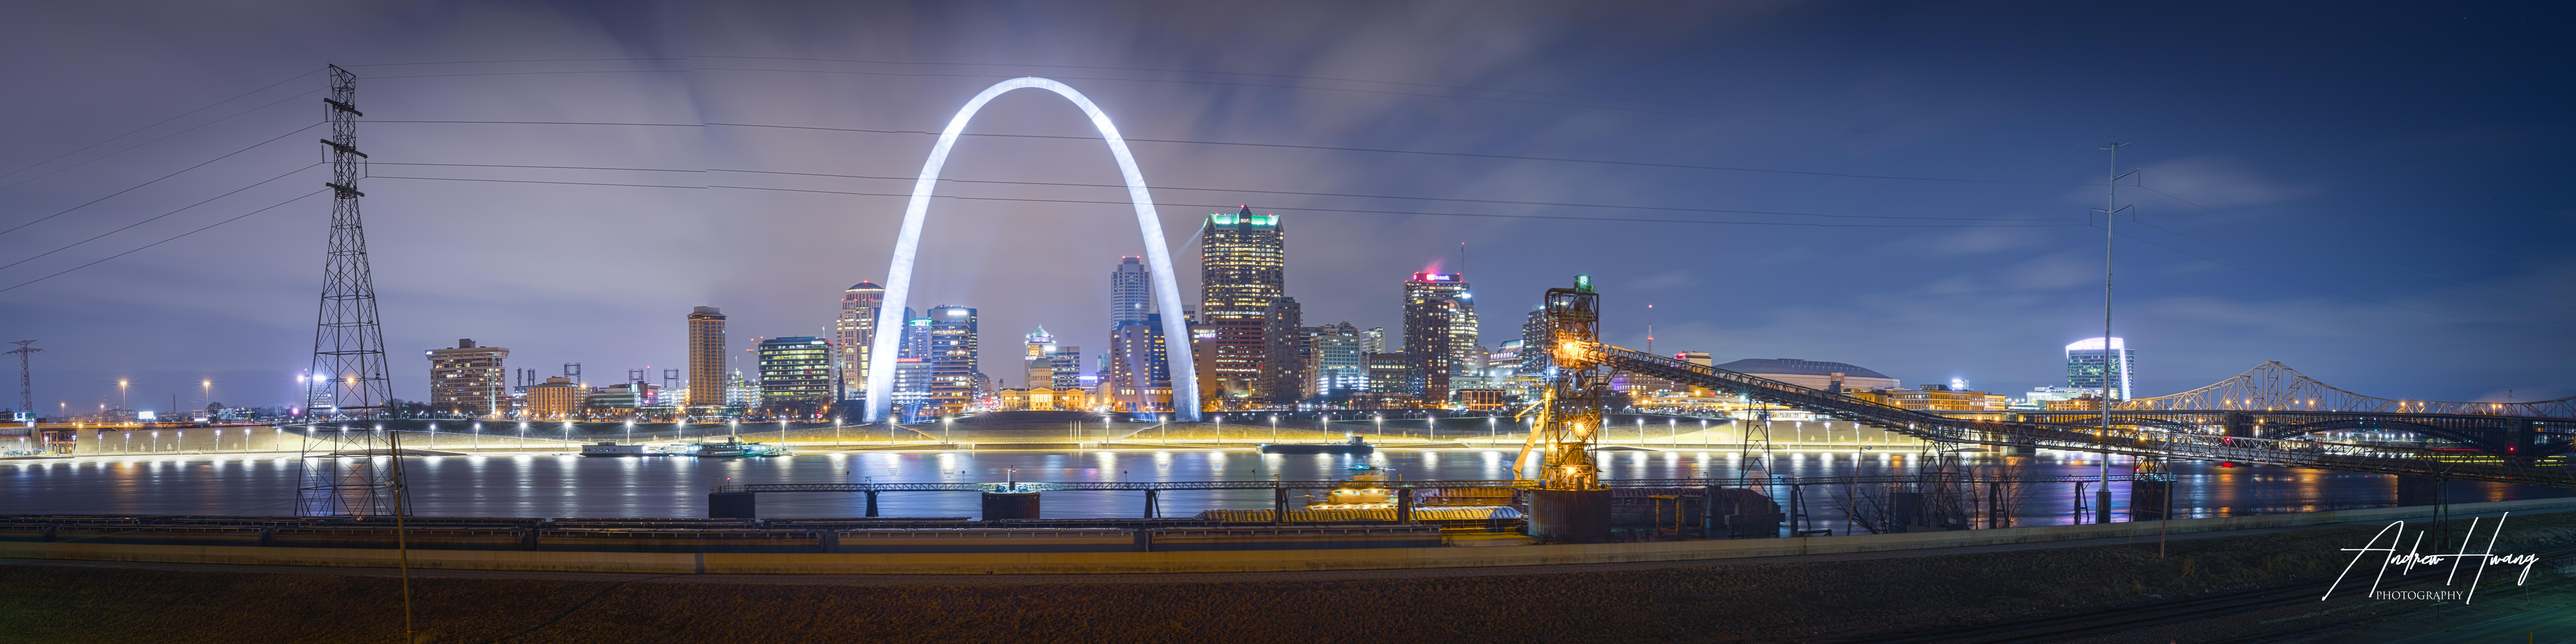 St Louis Pano